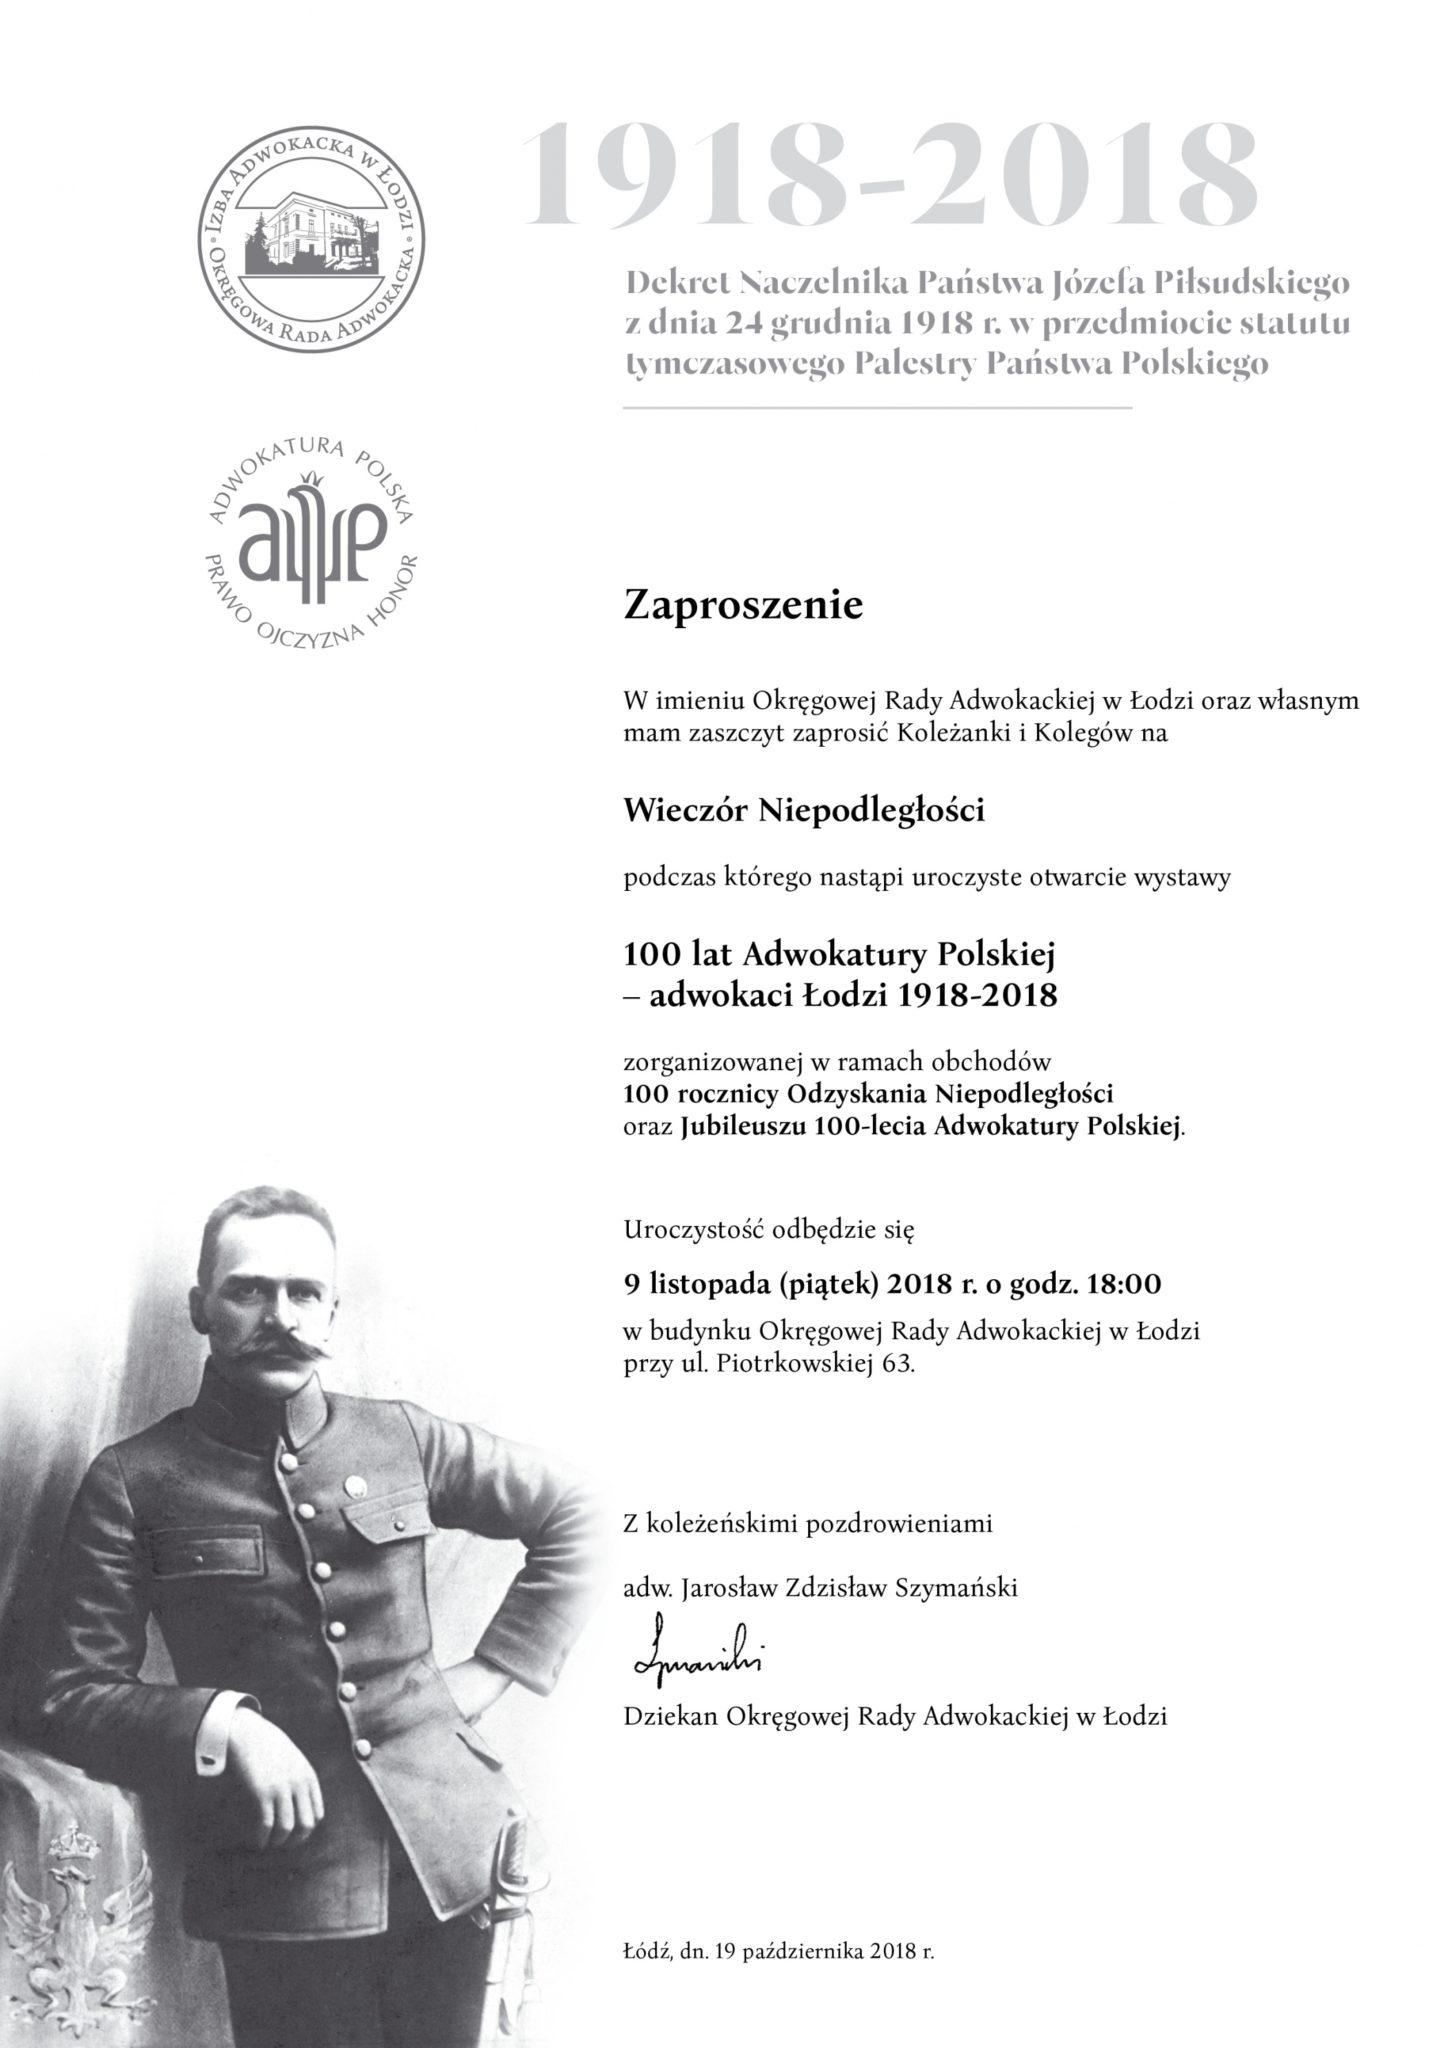 https://lodz.adwokatura.pl/wp-content/uploads/2019/04/file-orawystawazaproszeniea40208102018-3867.jpg